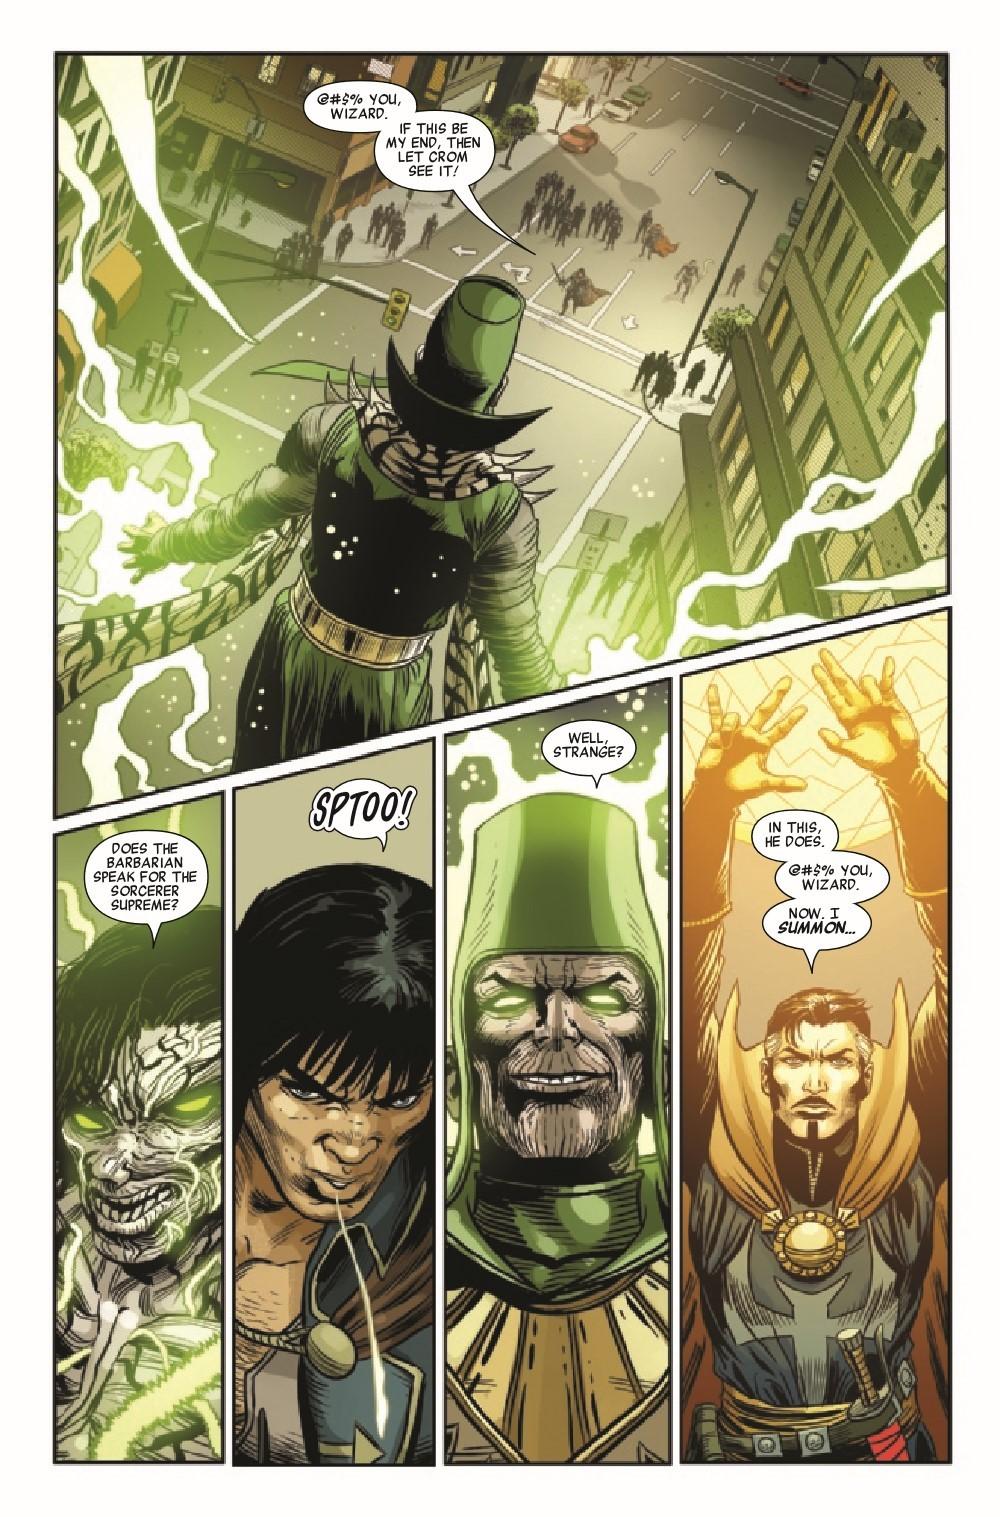 SAVAVEN2019024_Preview-5 ComicList Previews: SAVAGE AVENGERS #24